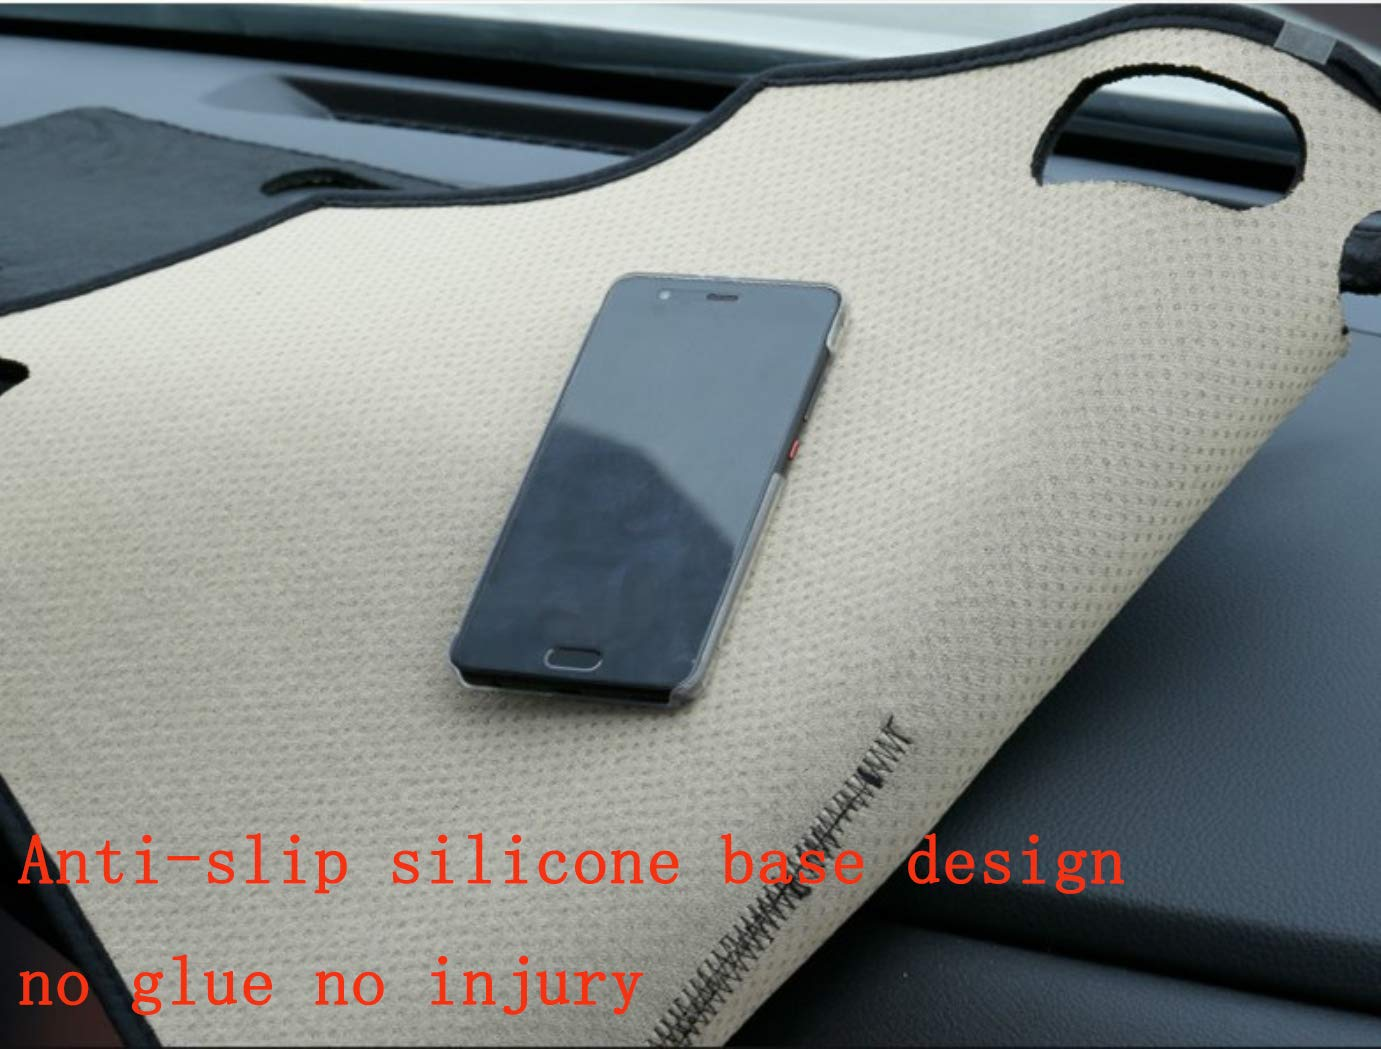 Oneuda Flannel Dashmat Dashboard Cover Dash Pad Car Mat Carpet Sun Shade for/Lexus is-F IS250 IS350 IS300 2006-2009 2010 2011 2012 2013 Anti-Slip Dash Board Cover Auto Accessories